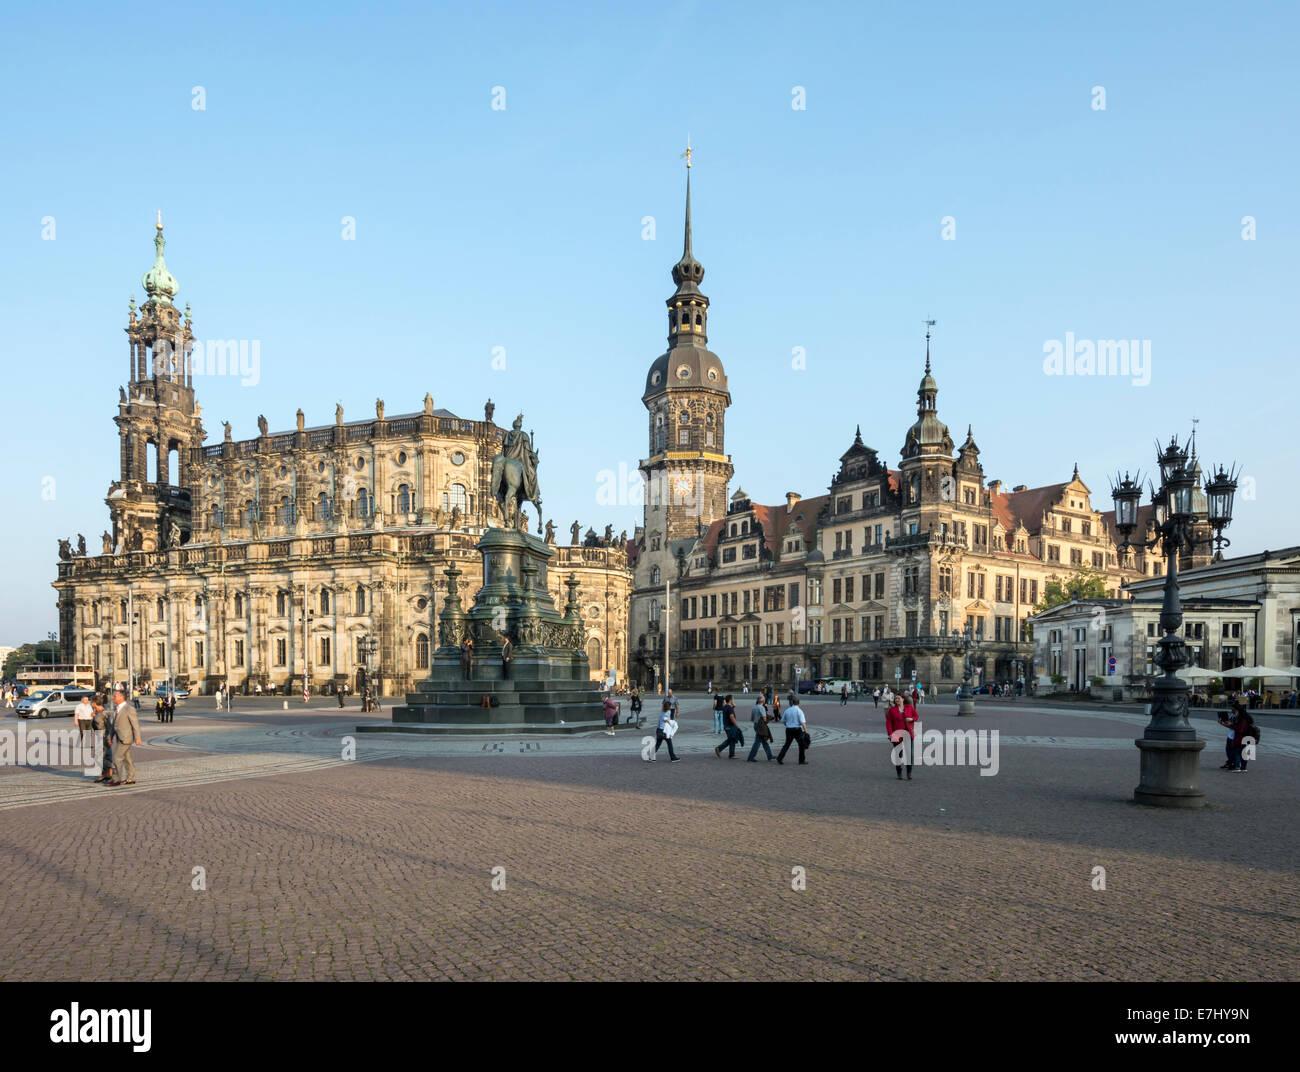 DRESDEN, Deutschland - 4 SEPTEMBER: Touristen auf dem Theaterplatz in Dresden, Deutschland am 4. September 2014. Stockbild